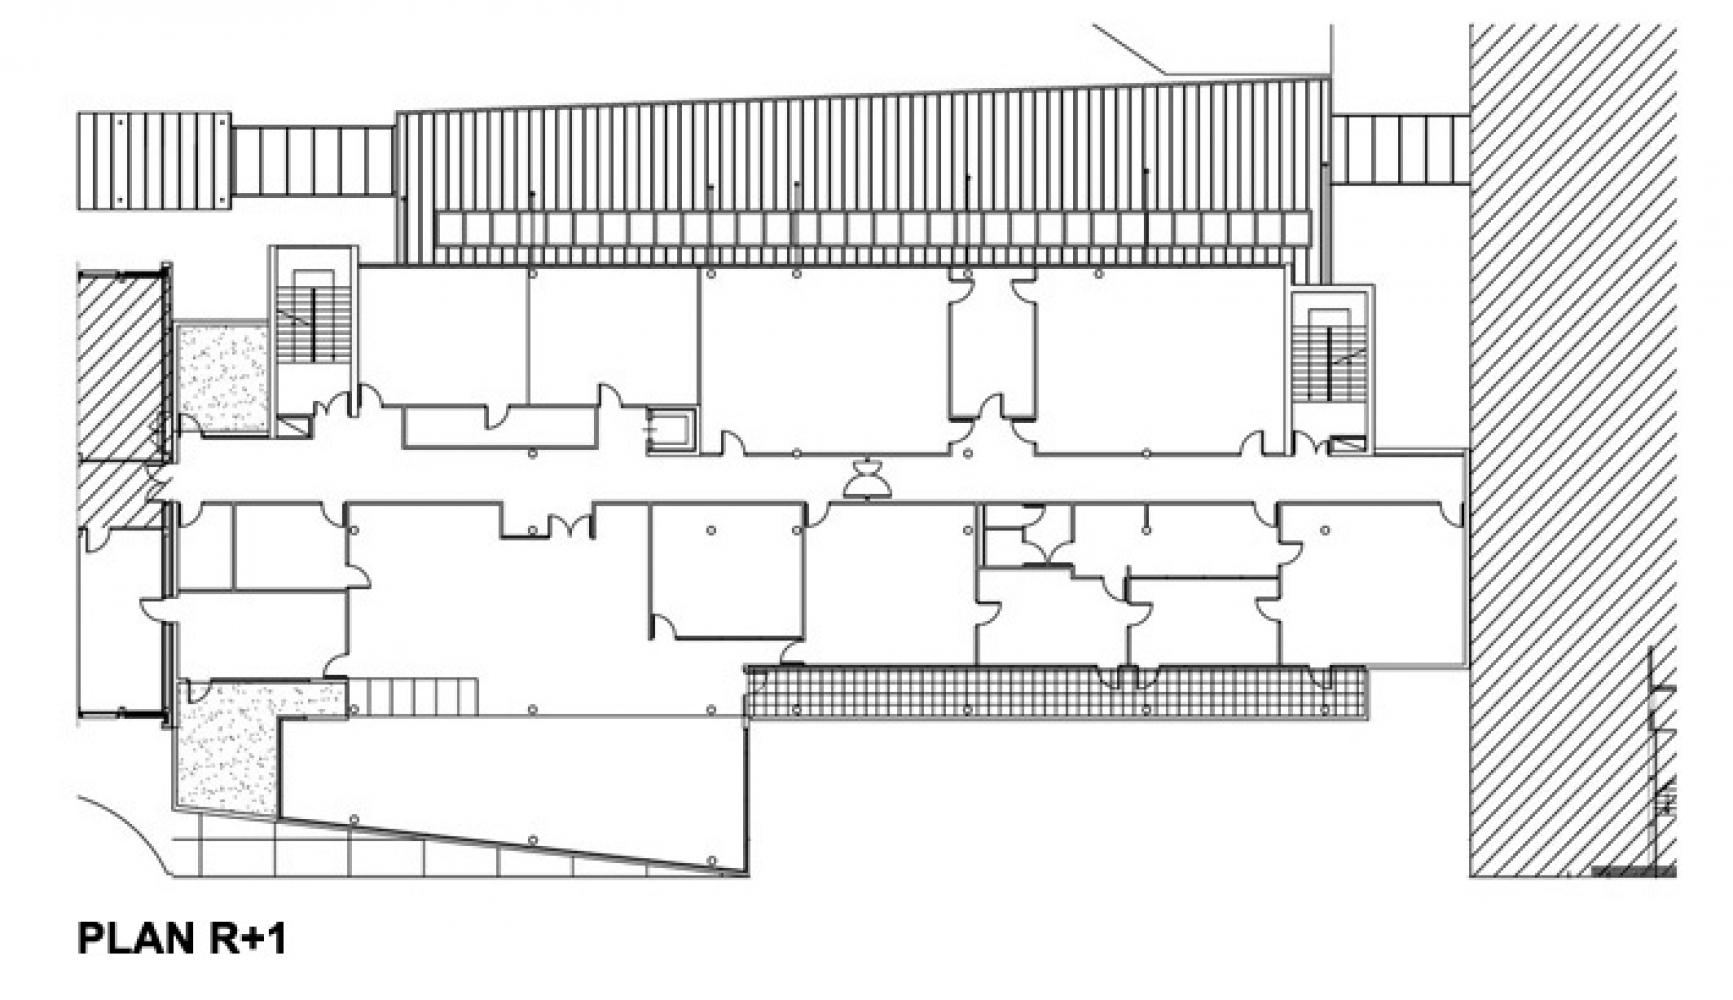 zmtn---05 Pascale SEURIN Architecte - Pascale SEURIN Architecte